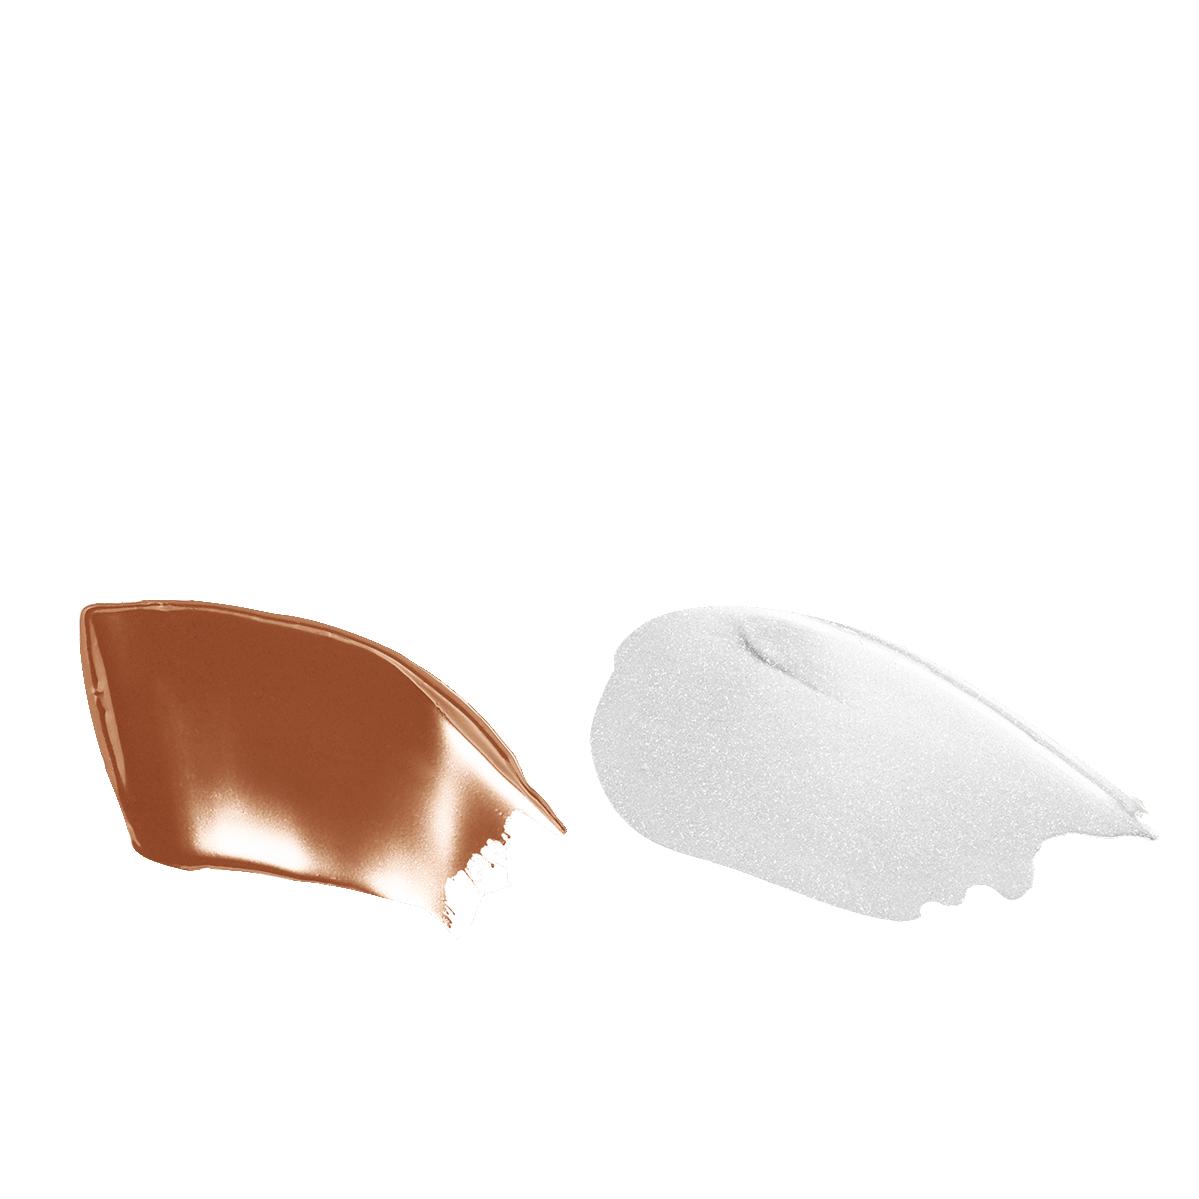 collab-contour-and-glow-cream-sculpting-palette-lightmedium-shade.png